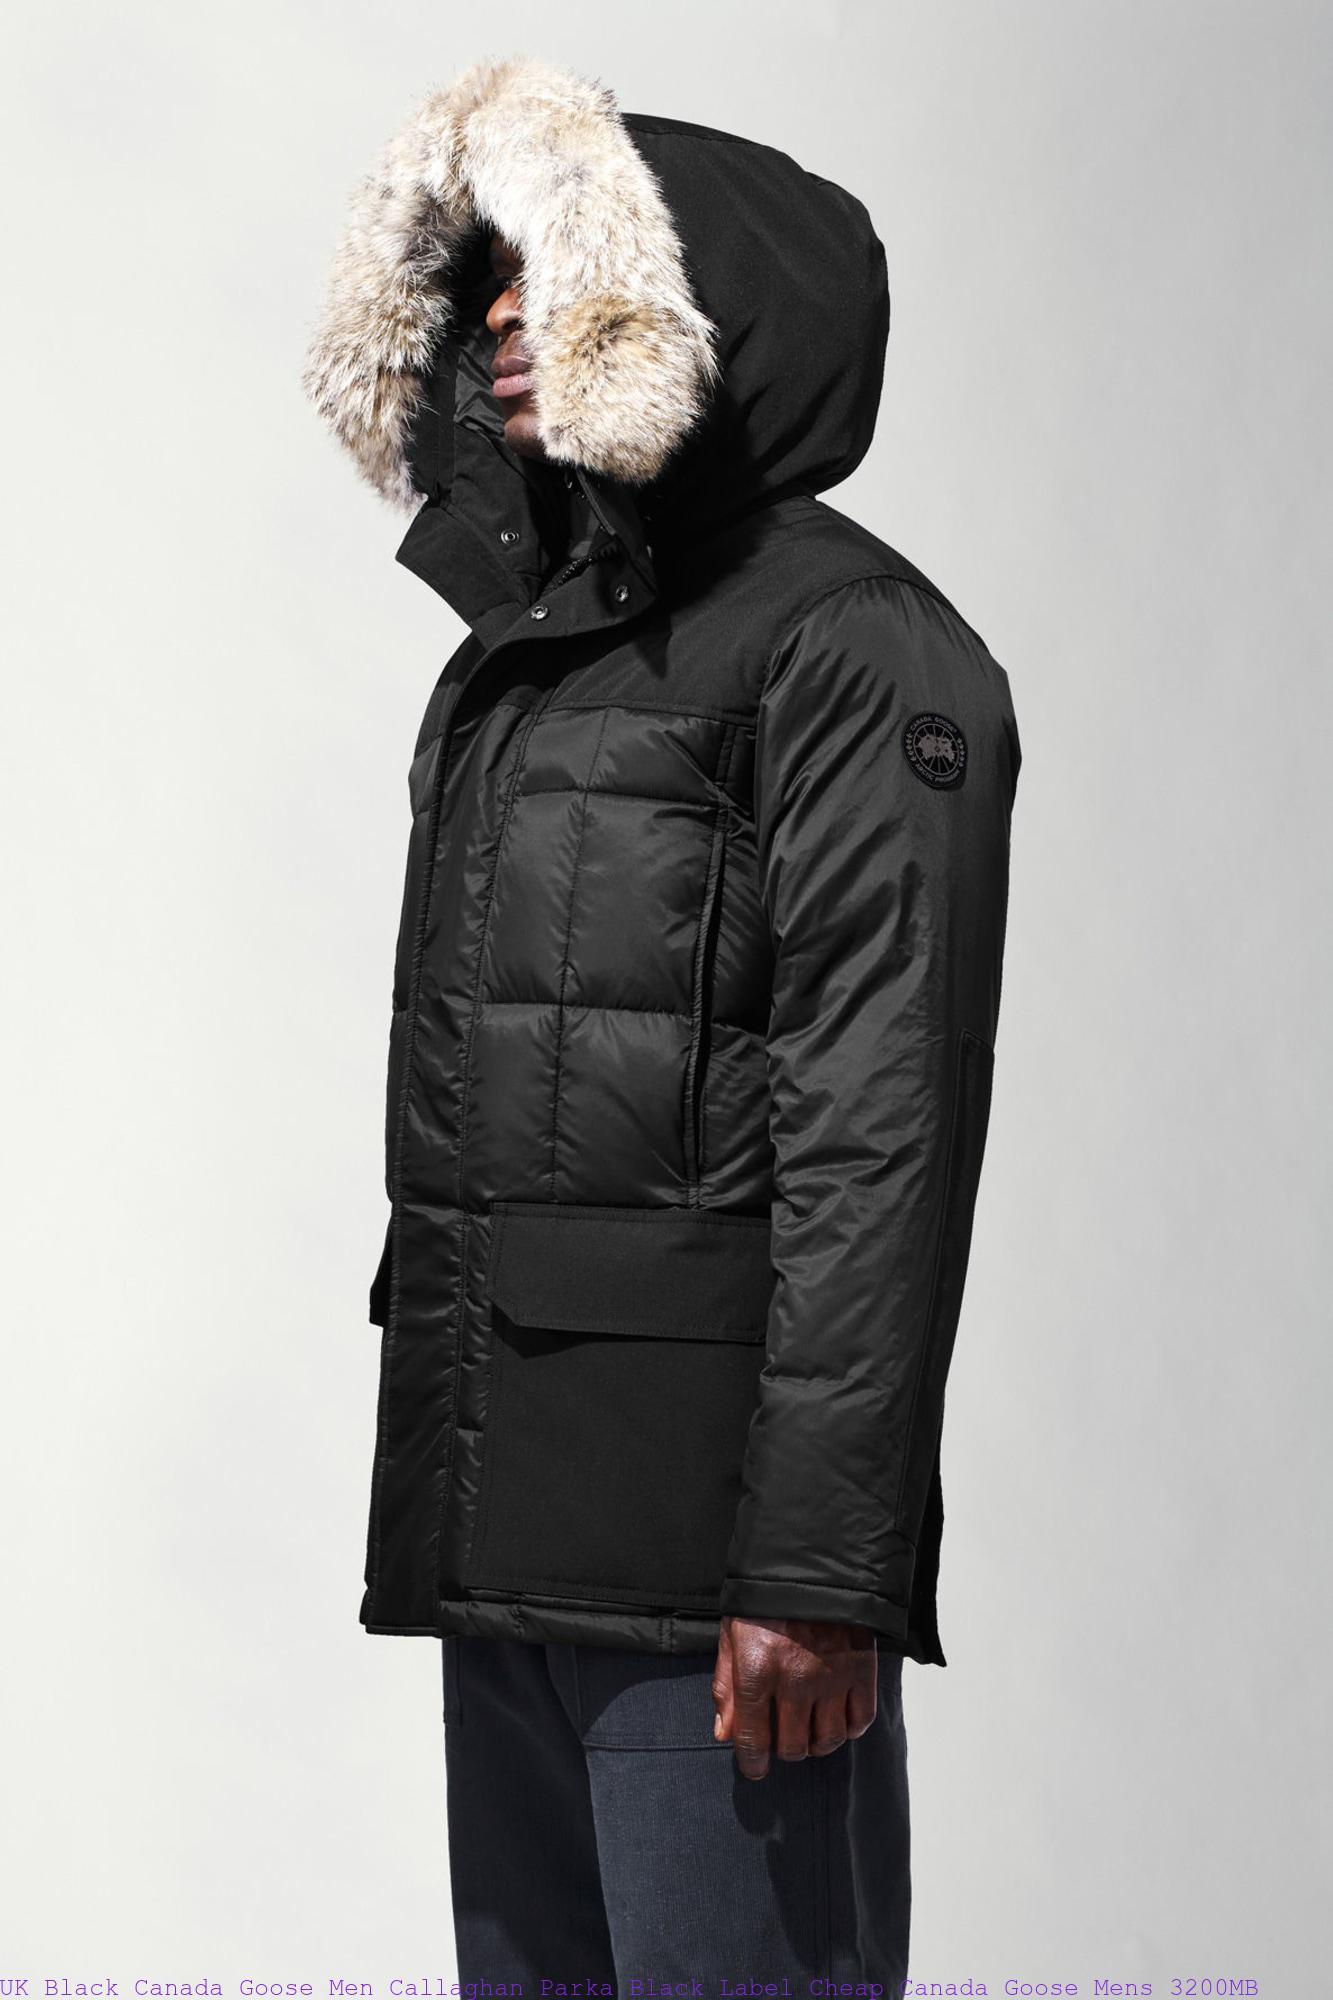 98265ee6340 UK Black Canada Goose Men Callaghan Parka Black Label Cheap Canada Goose  Mens 3200MB – Ordering Cheap Canada Goose® Outlet Online